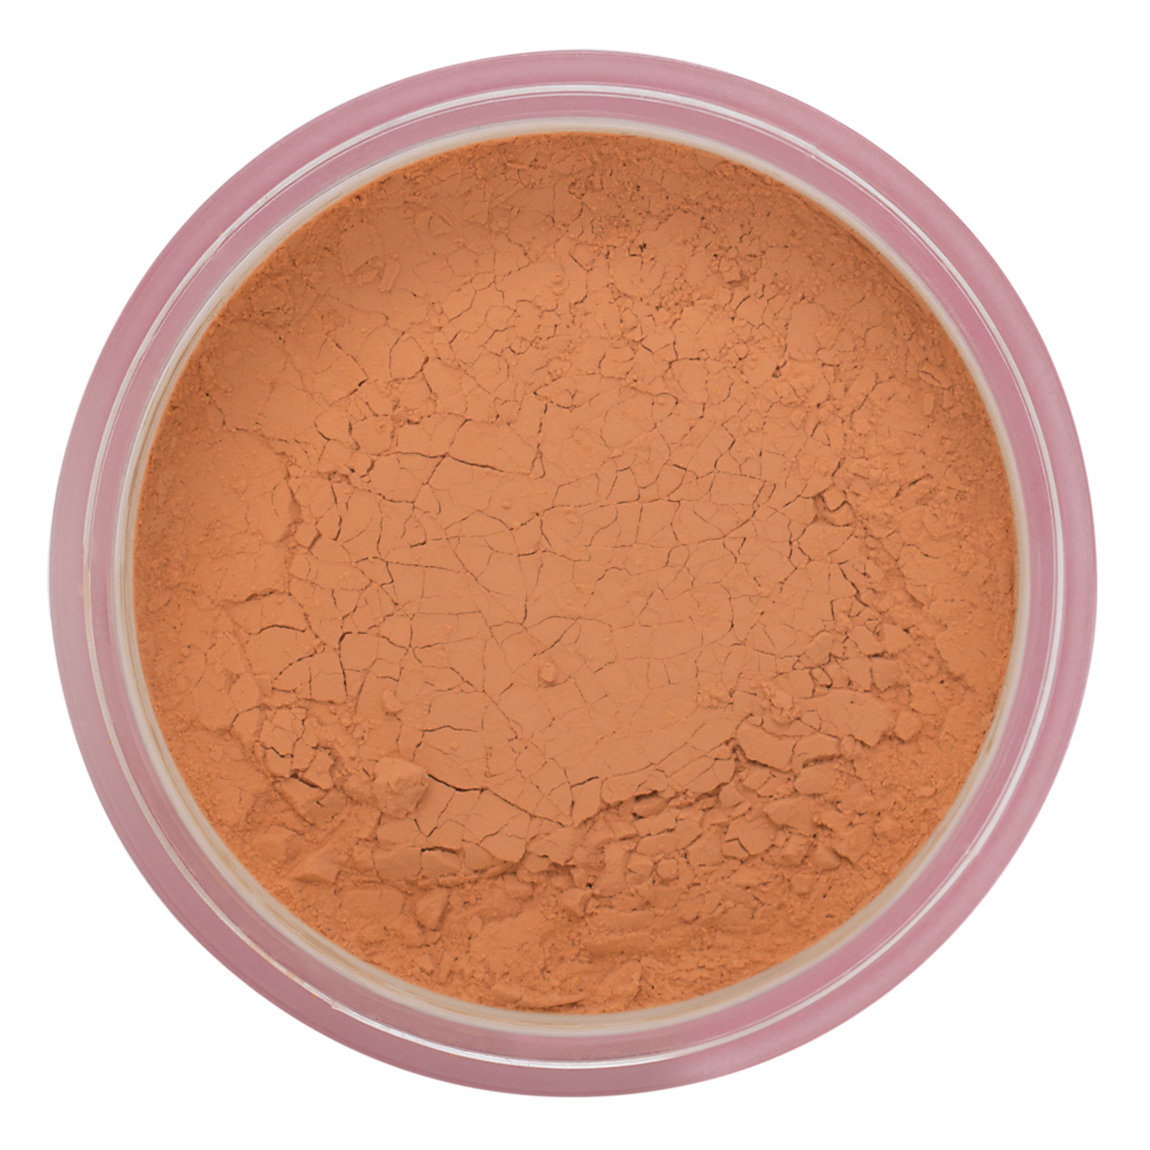 IT Cosmetics  Bye Bye Breakout Powder Light/Medium product swatch.